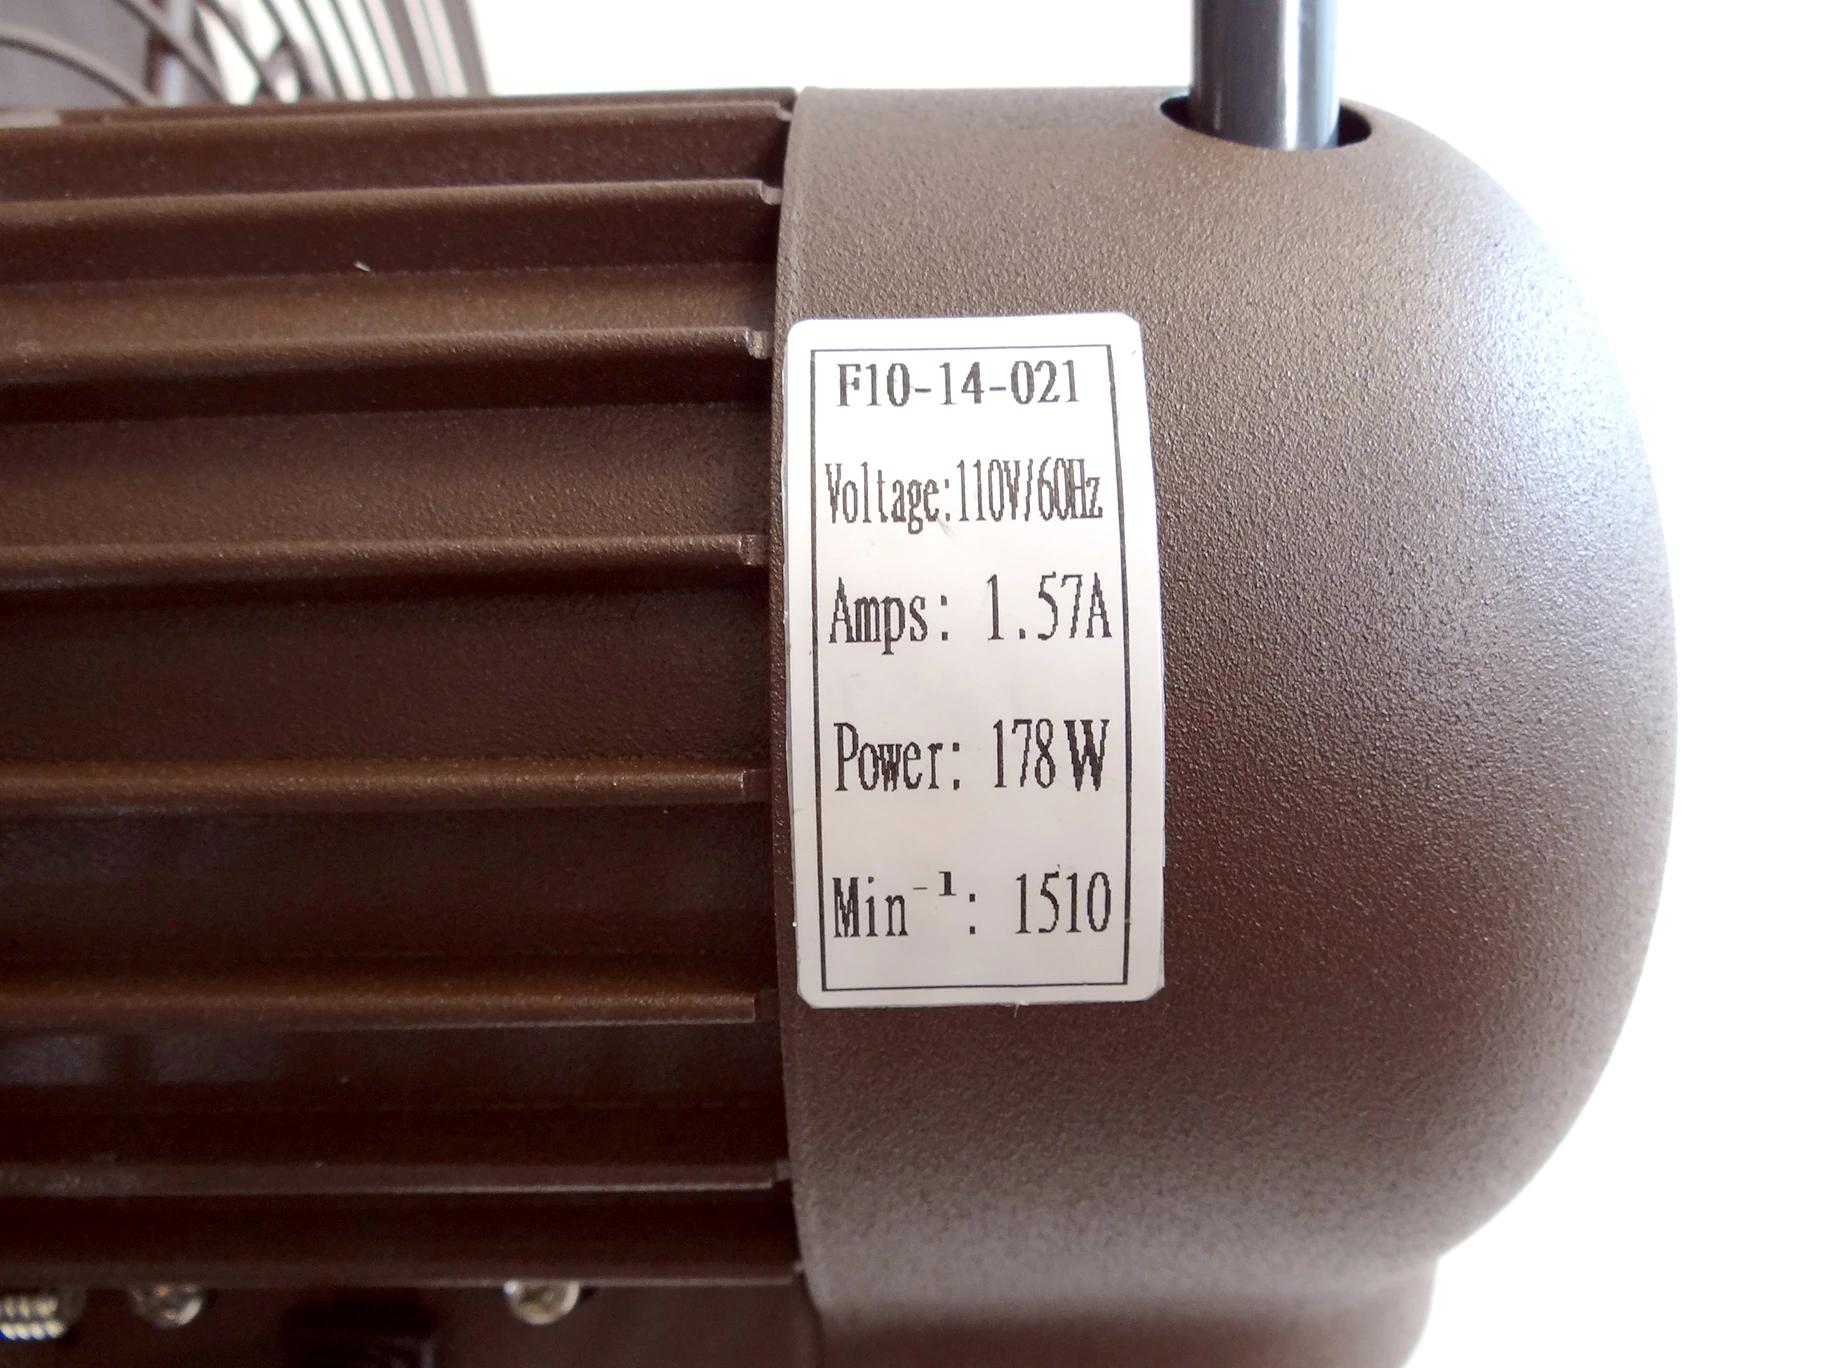 Motor information for Outdoor 18 inch shrouded oscillating fan